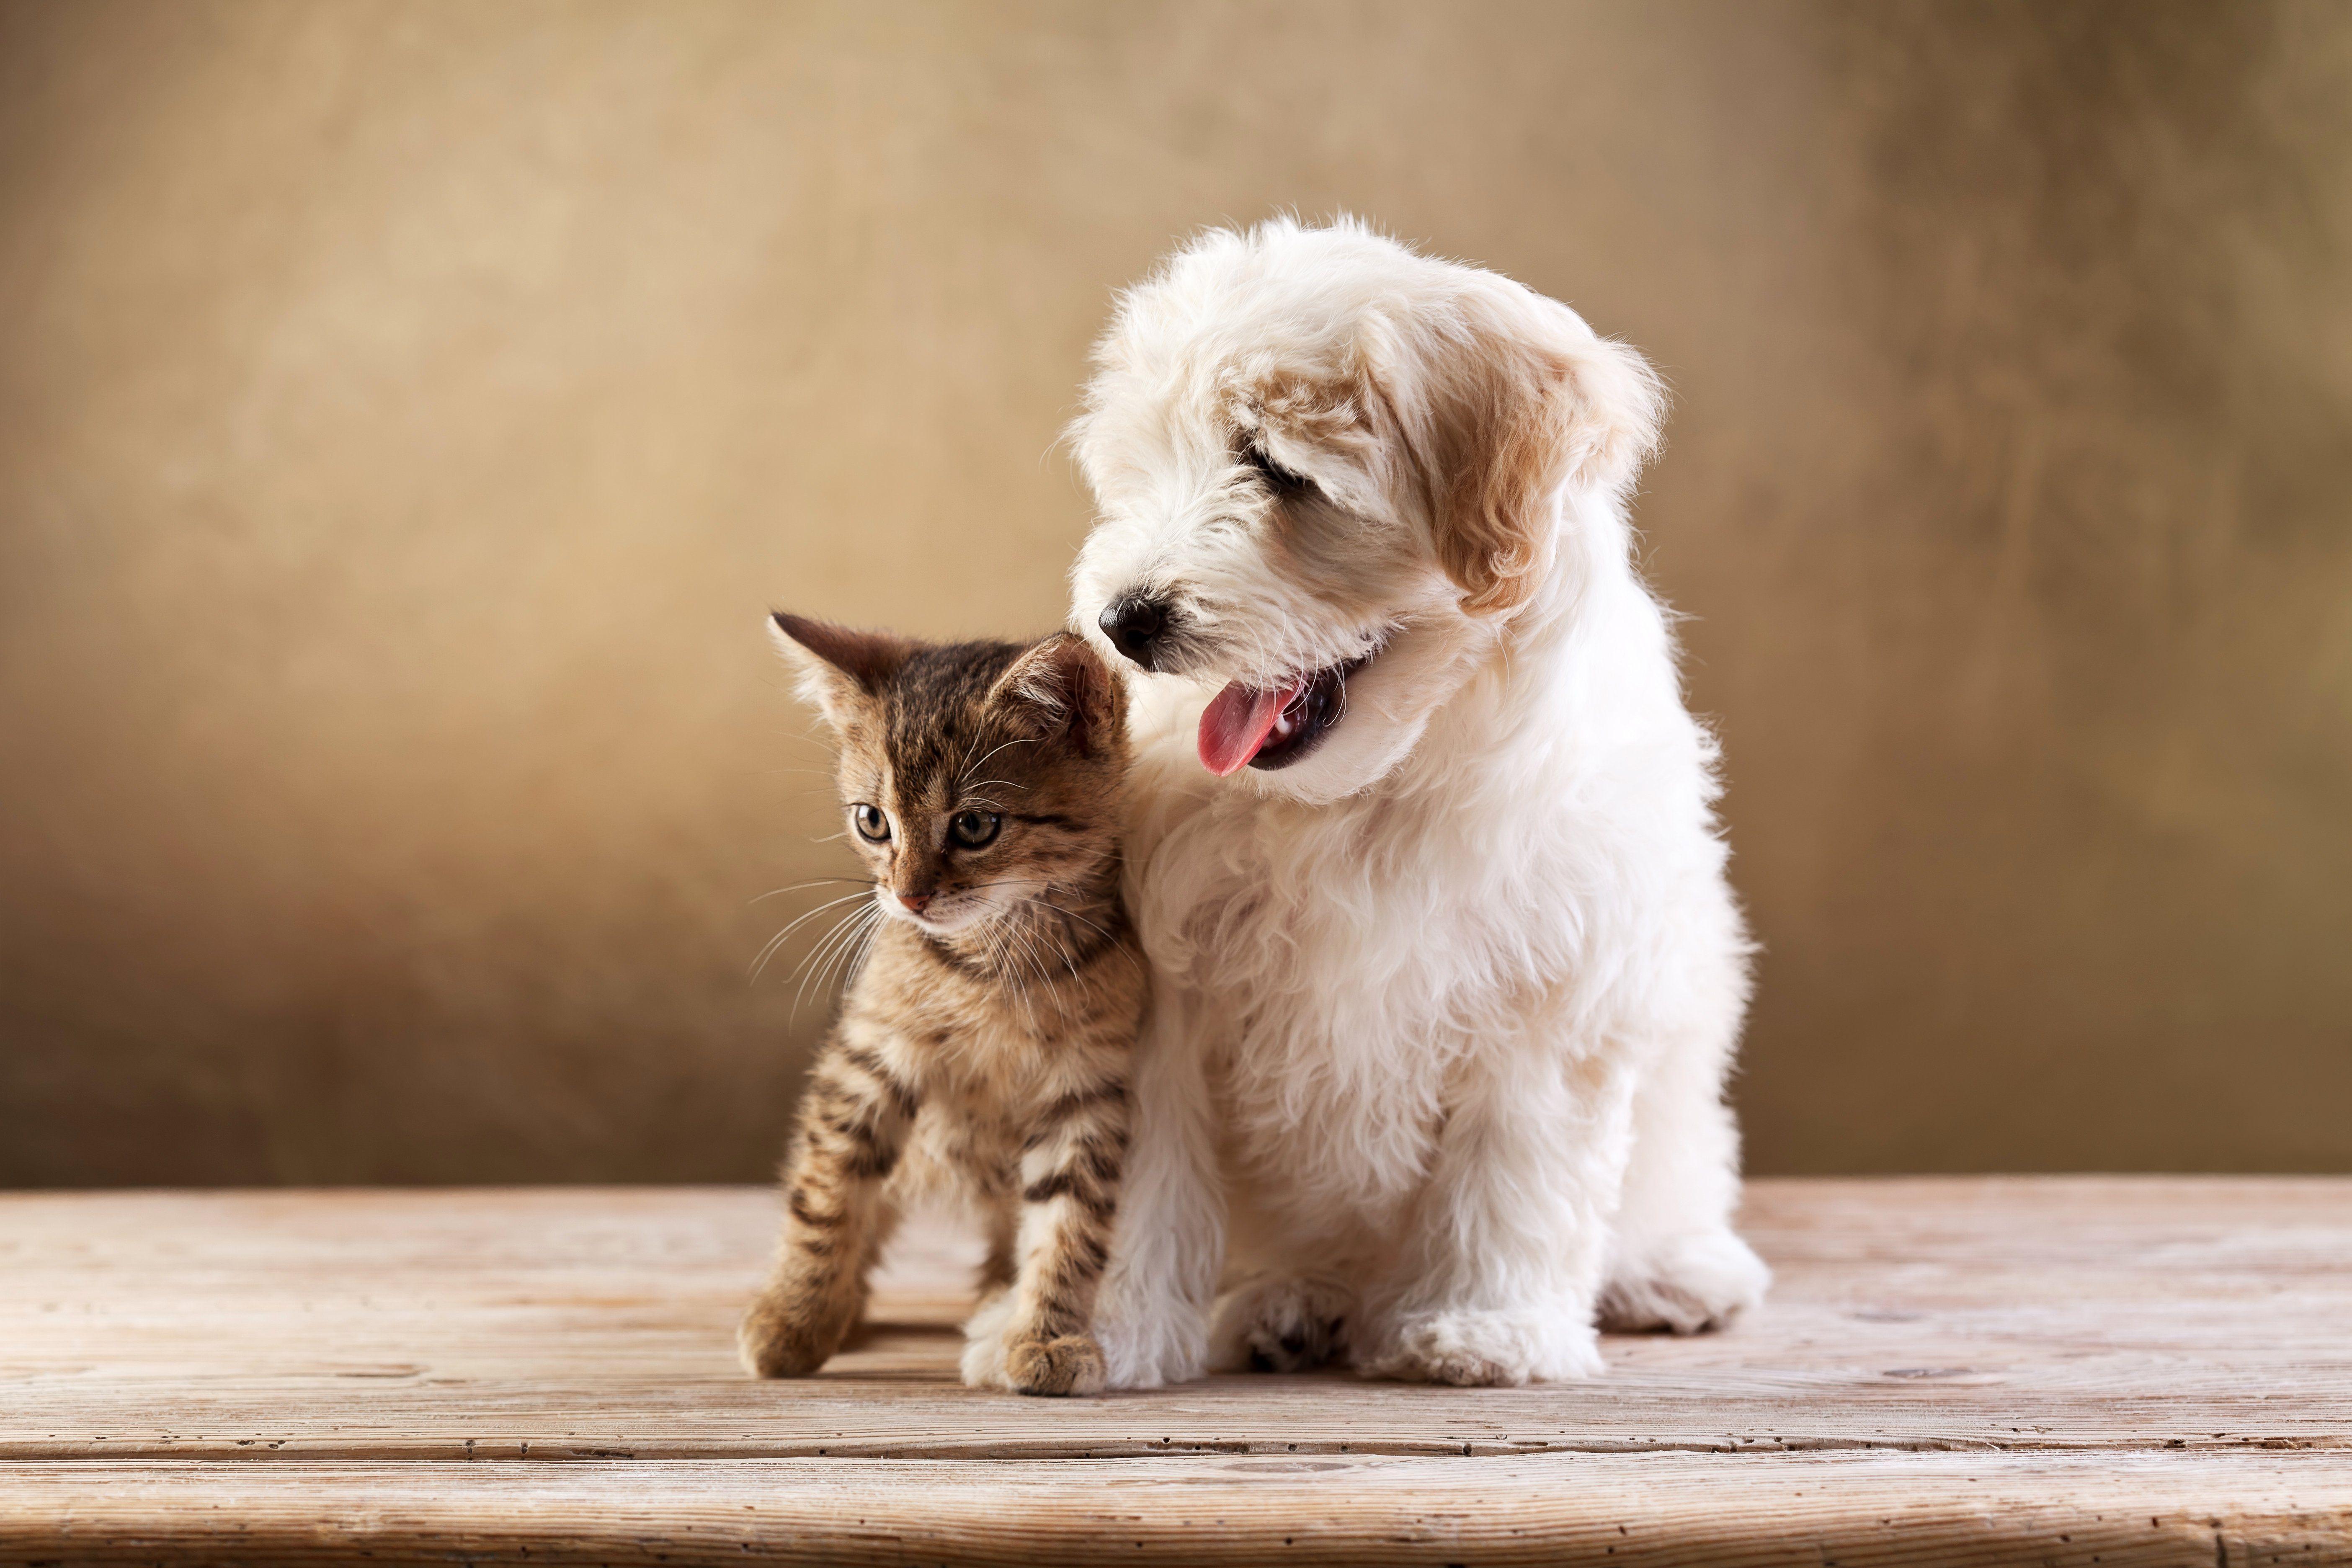 Kitten And Puppy Wallpaper Desktop For Desktop Wallpaper In